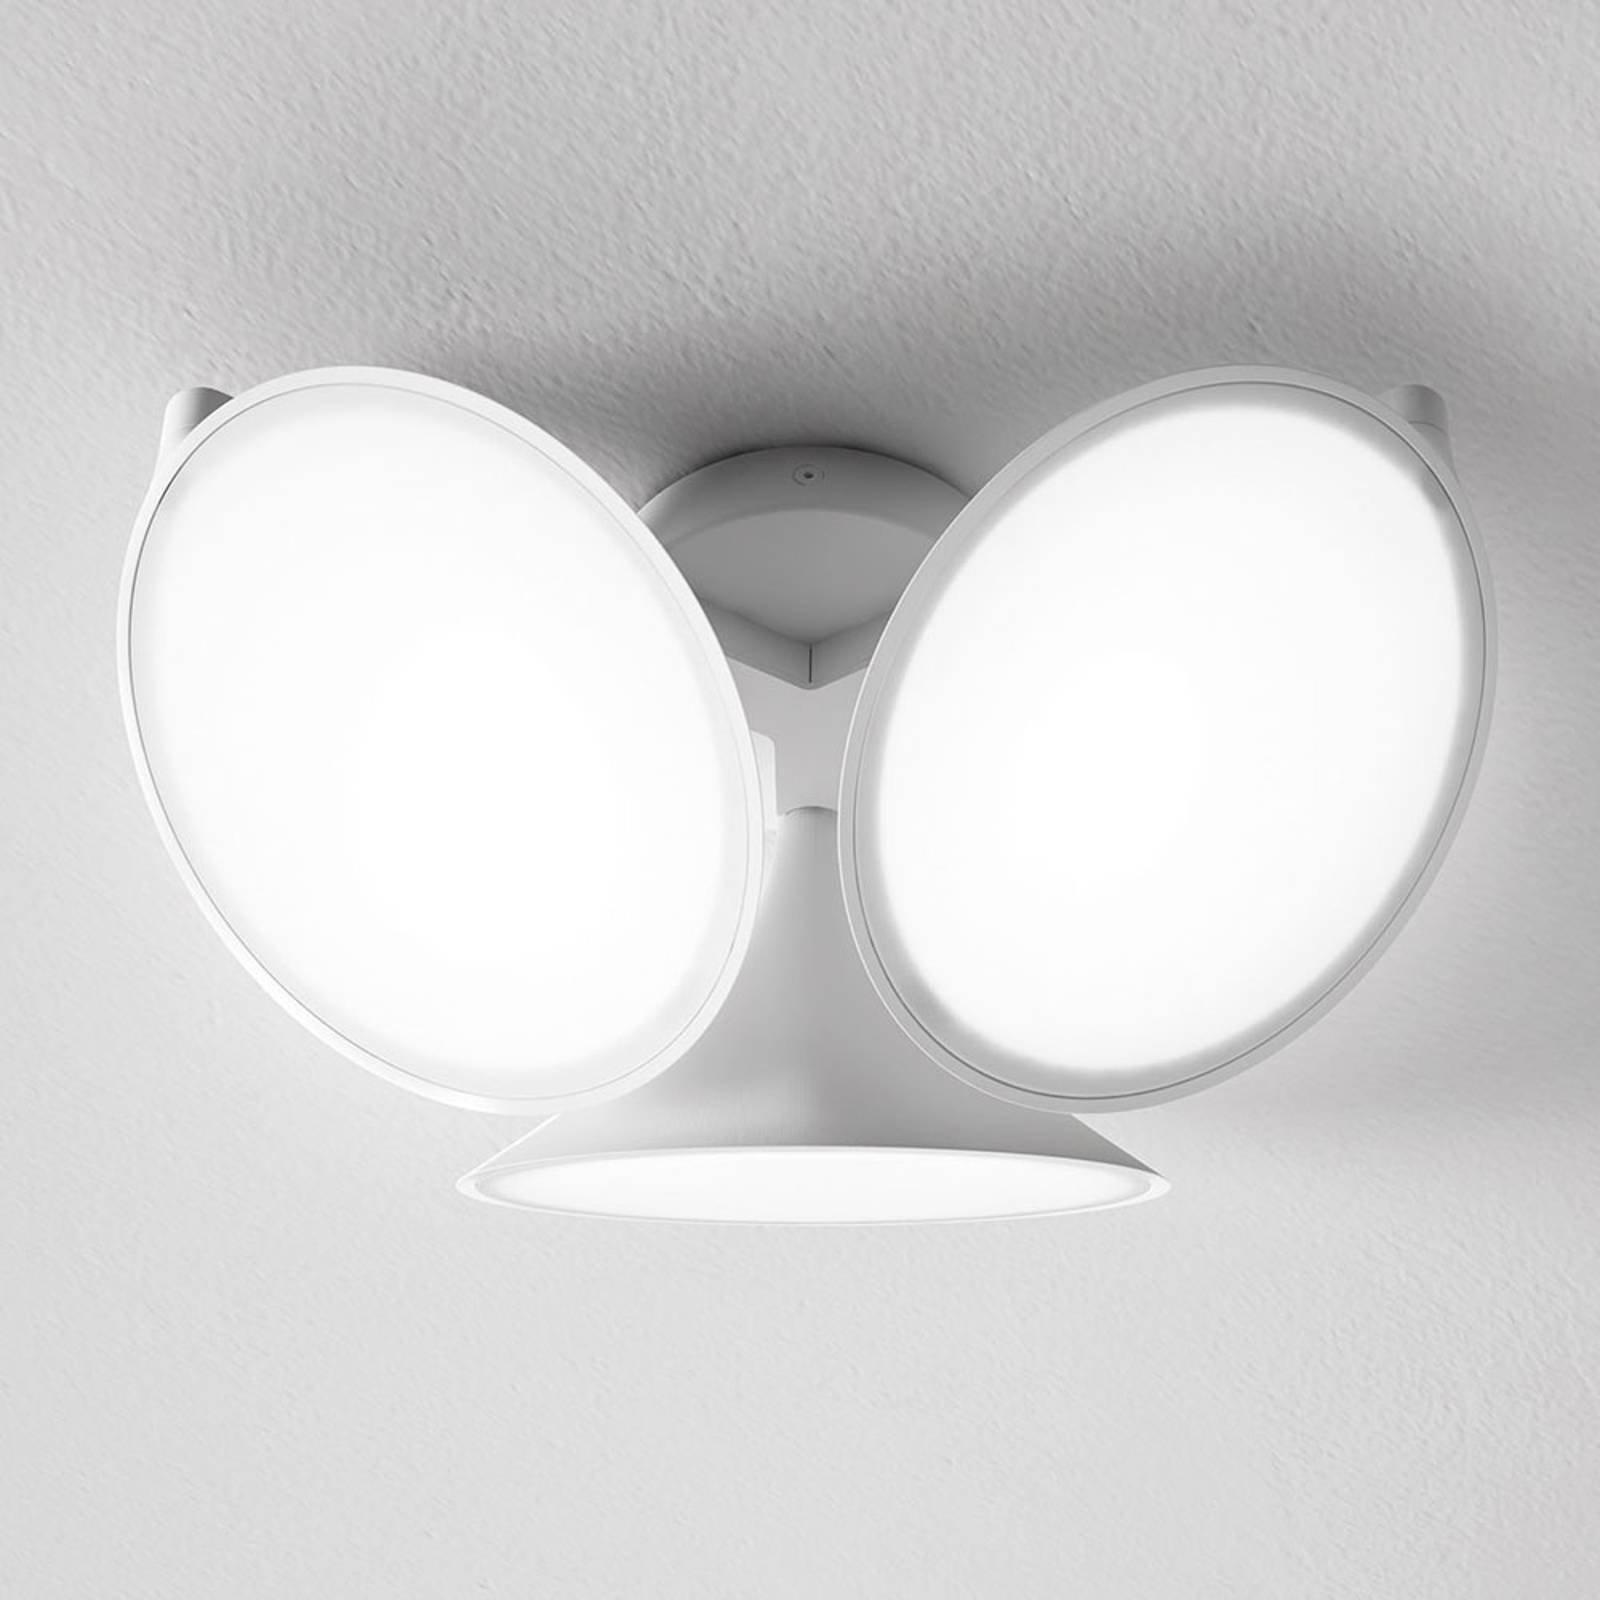 Axolight Orchid LED-taklampe, hvit